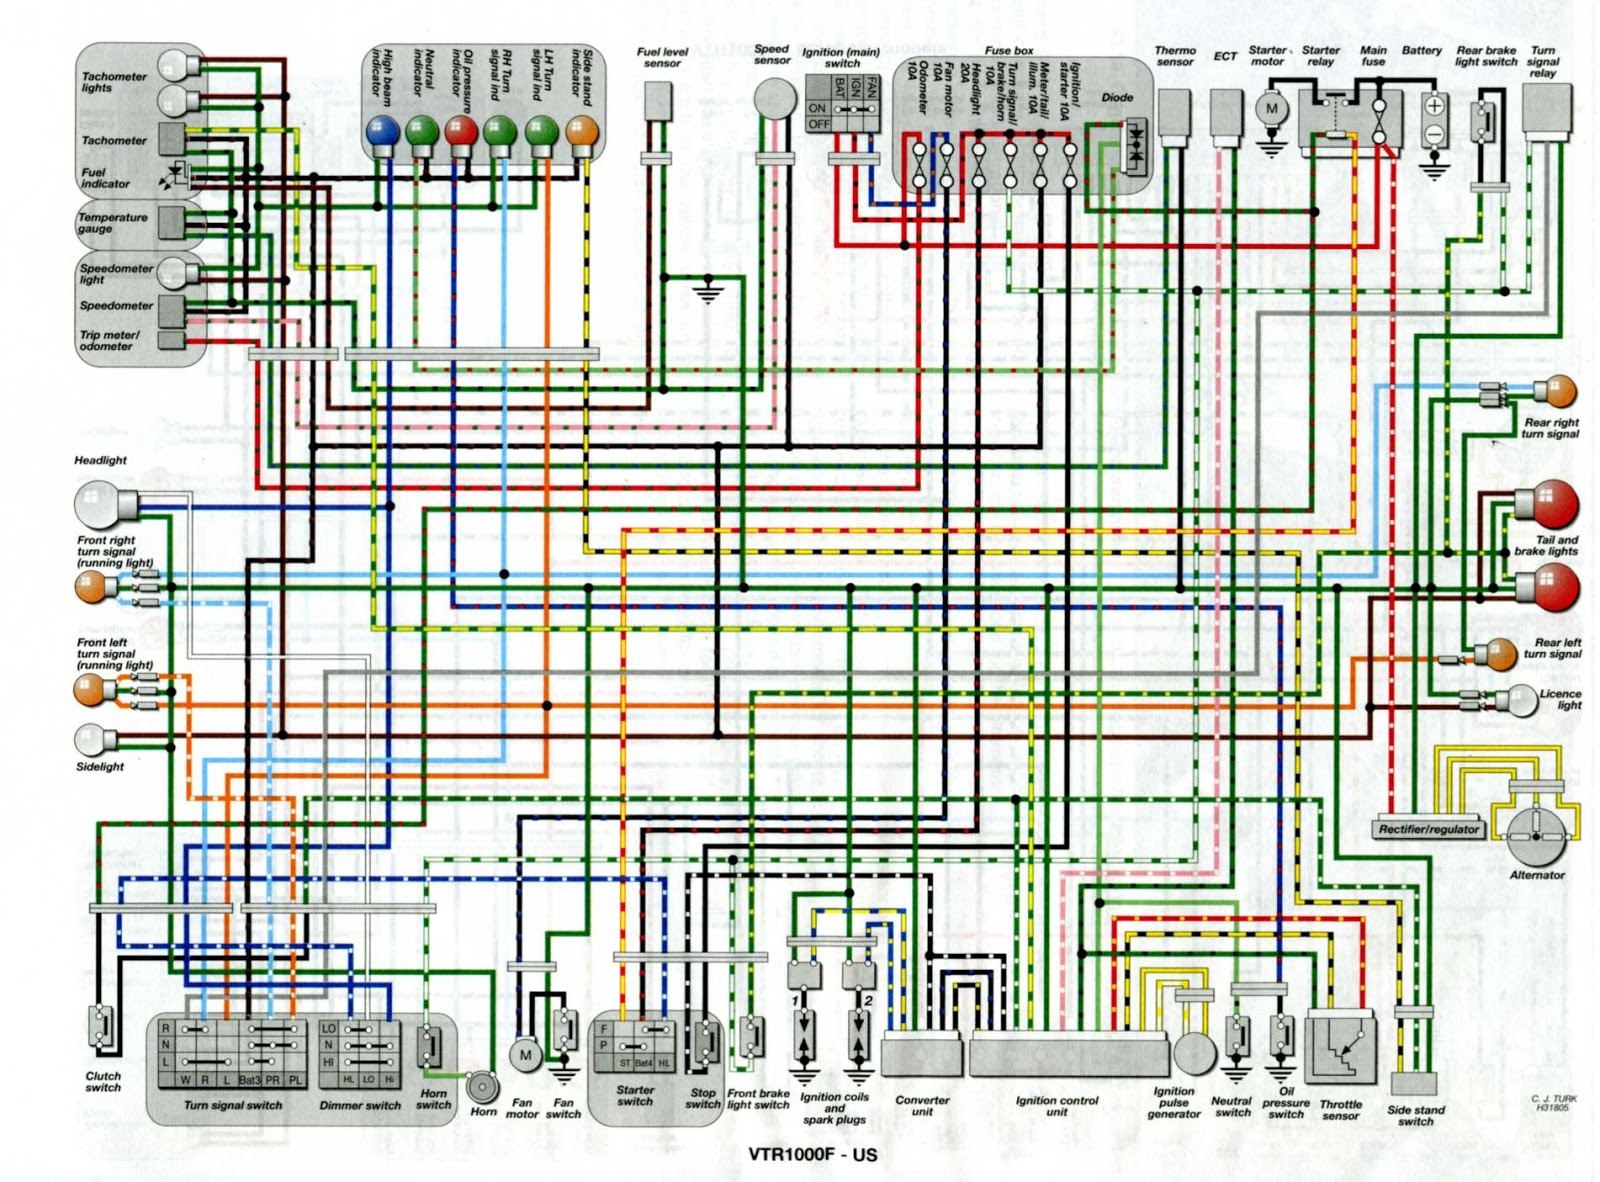 1980 honda cb750 wiring diagram dolgular com 1975 Honda Cb360t Wiring Diagram  1972 Honda Cb750 Wiring Diagram 1975 Yamaha Xs650 Wiring Diagram 1975 Norton Commando Wiring Diagram